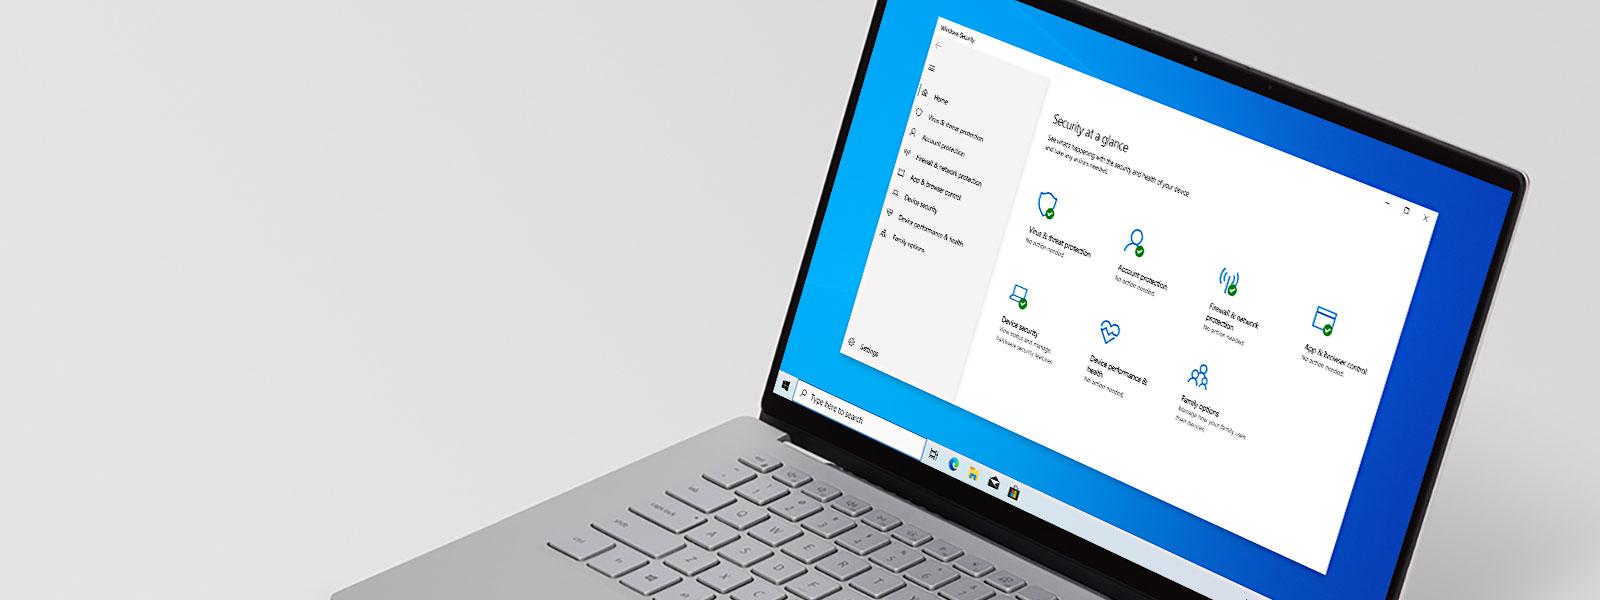 Portátil Windows 10 a apresentar a janela do Antivírus do Microsoft Defender